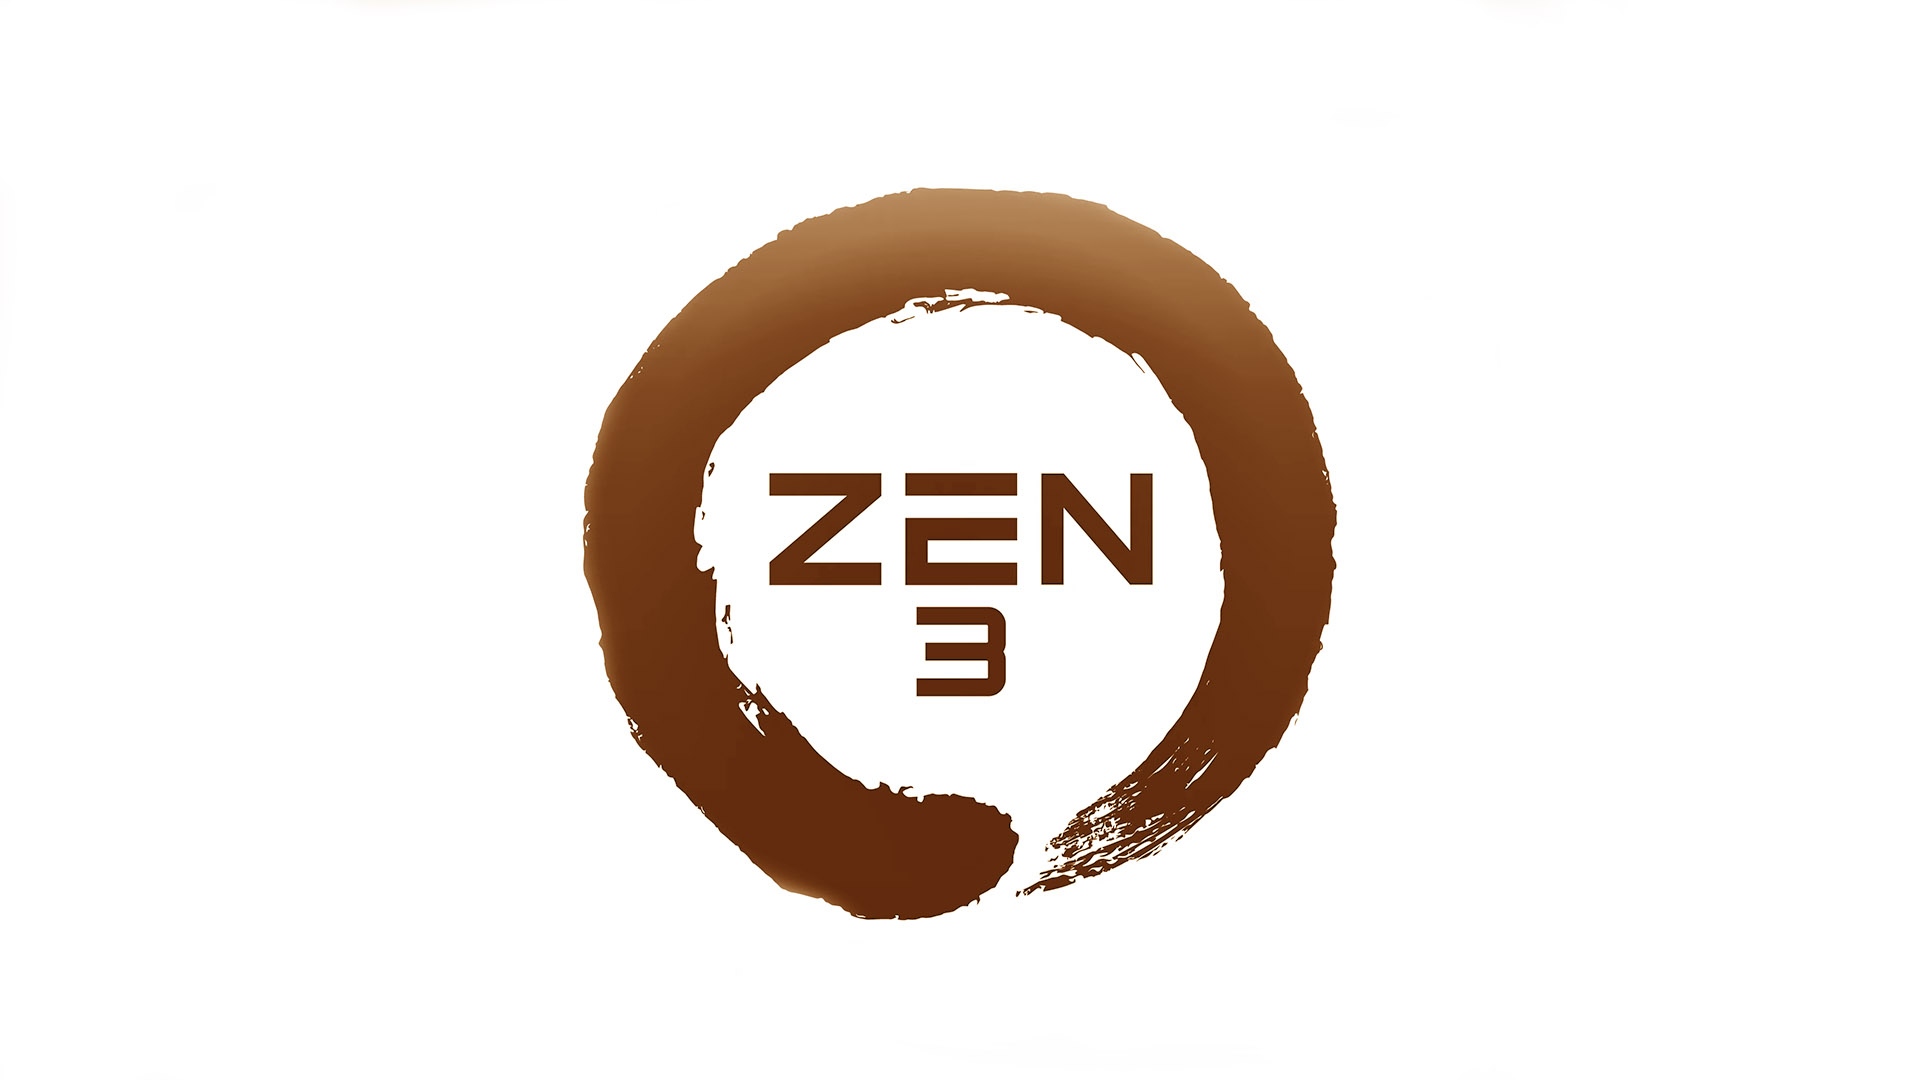 Here S How To Watch The Amd Zen 3 Announcement Vgamezone